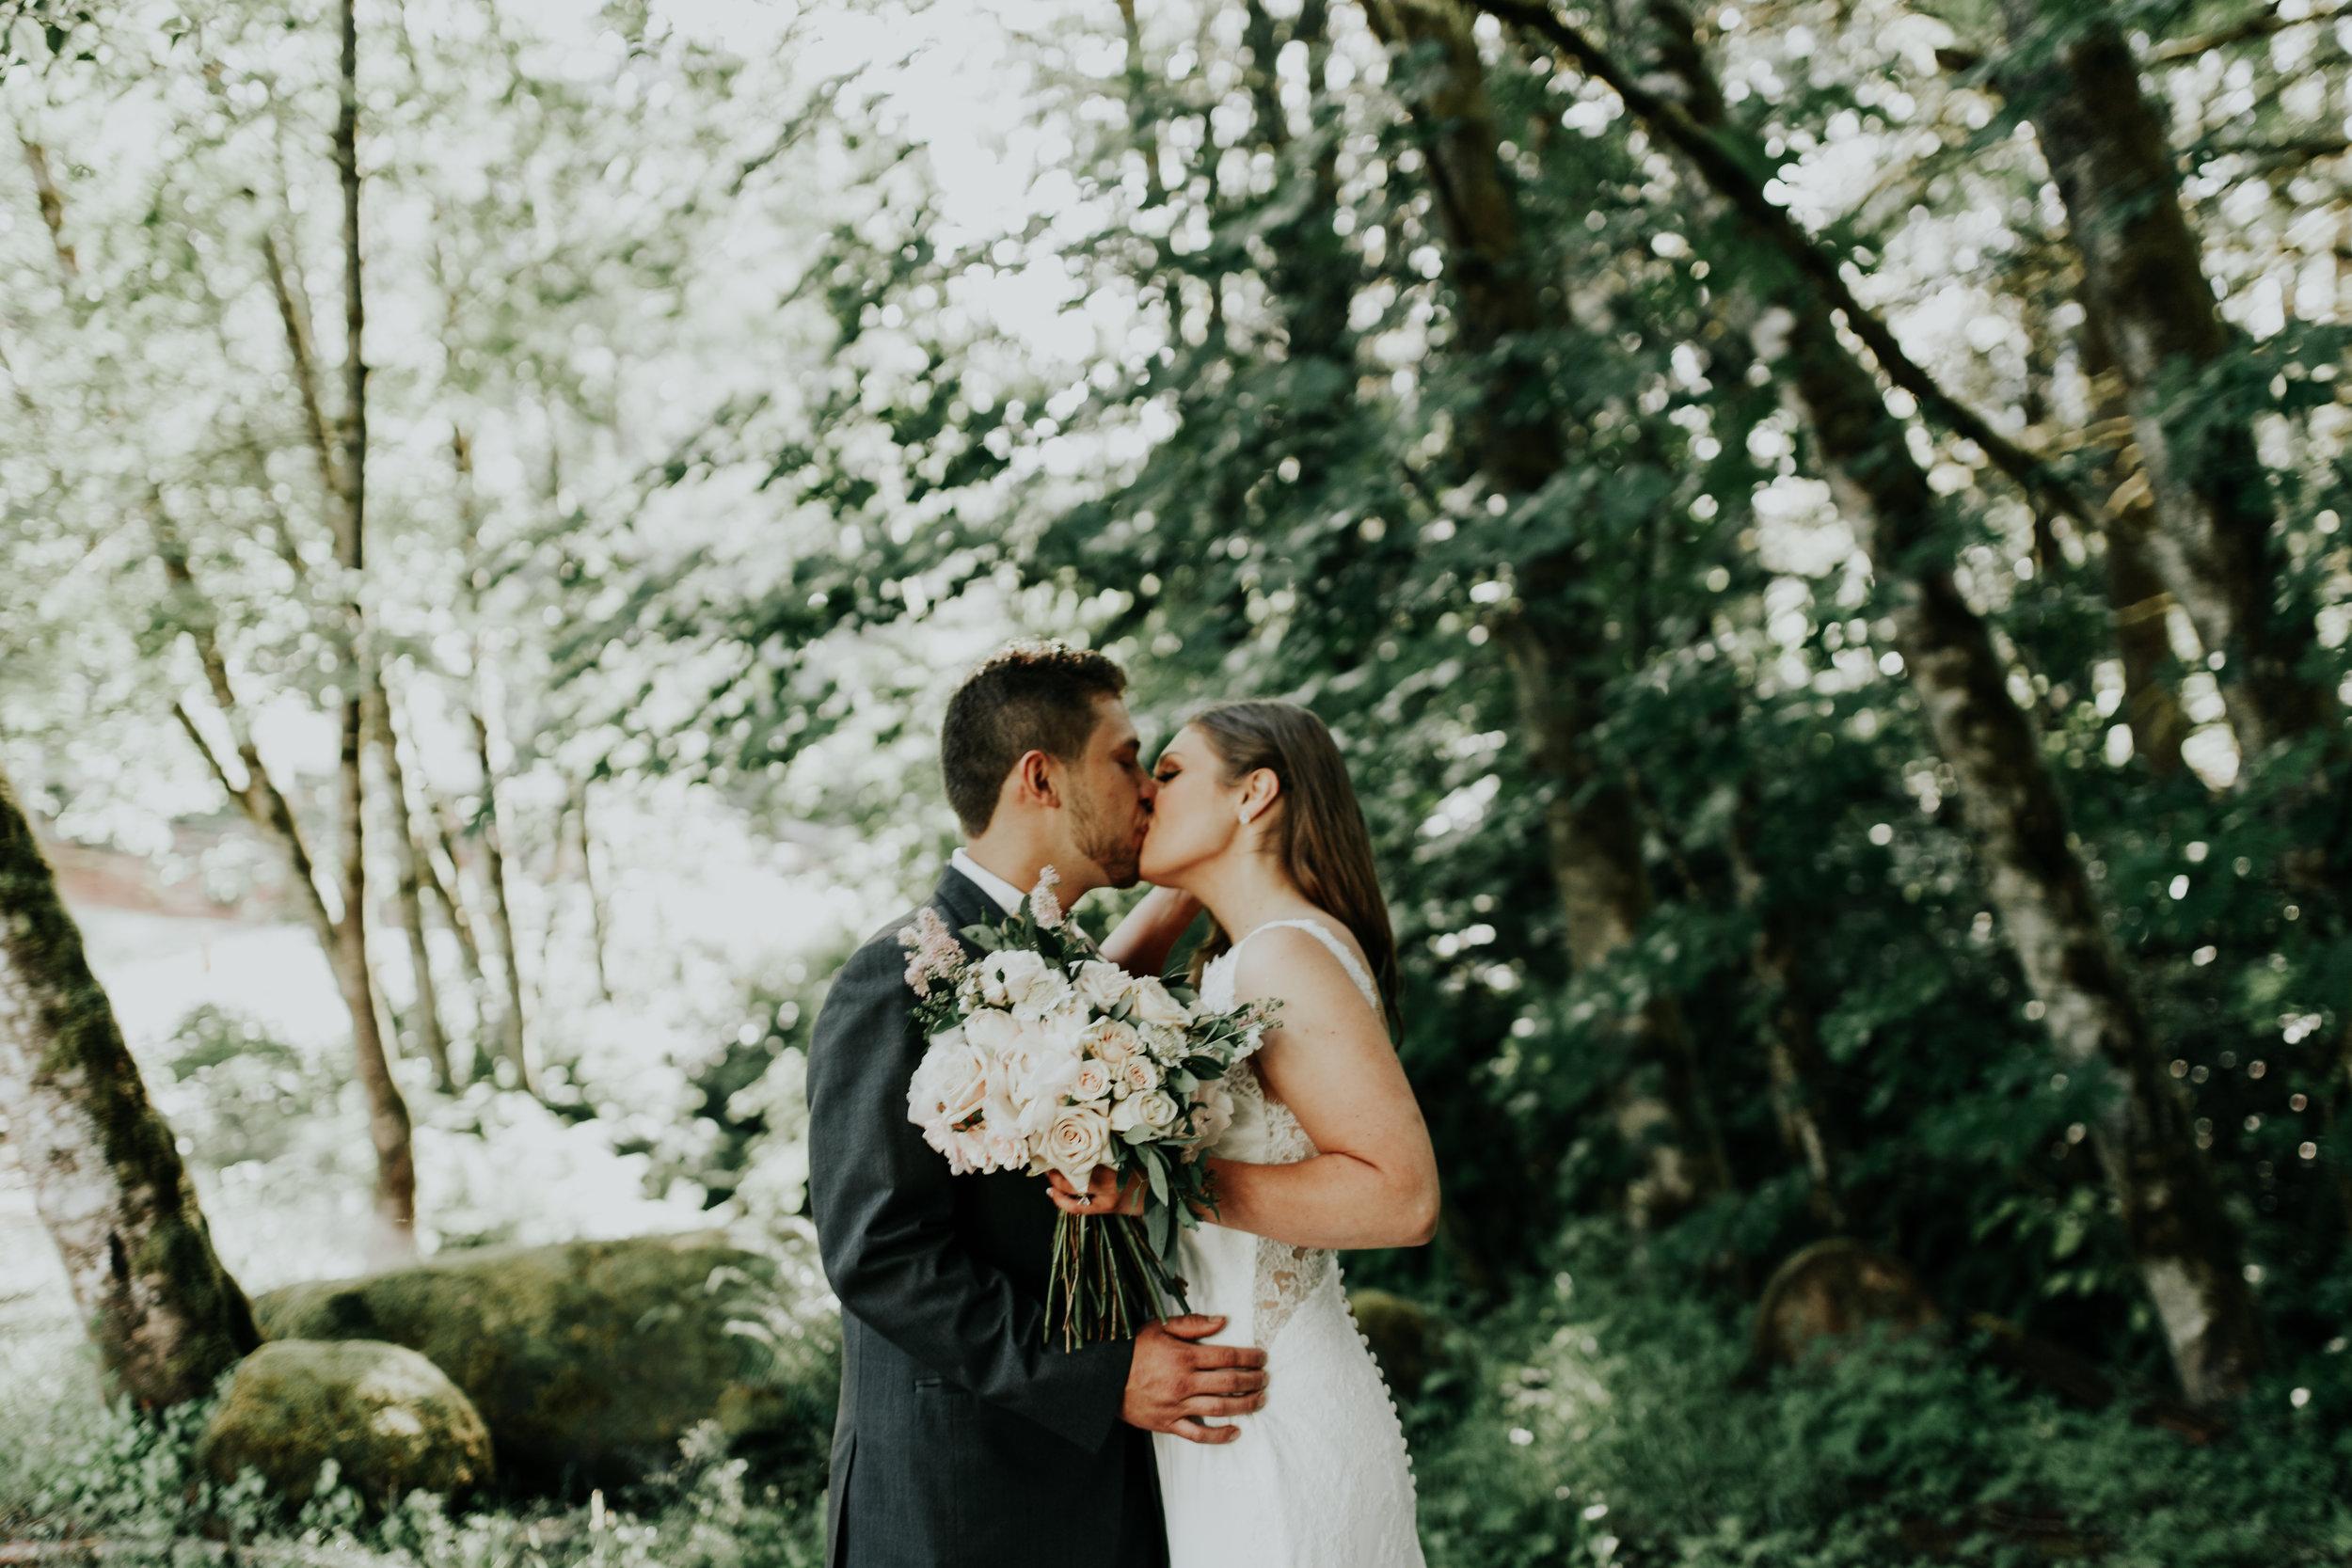 ramirez-wedding-portland-jamiecarle-6789.jpg